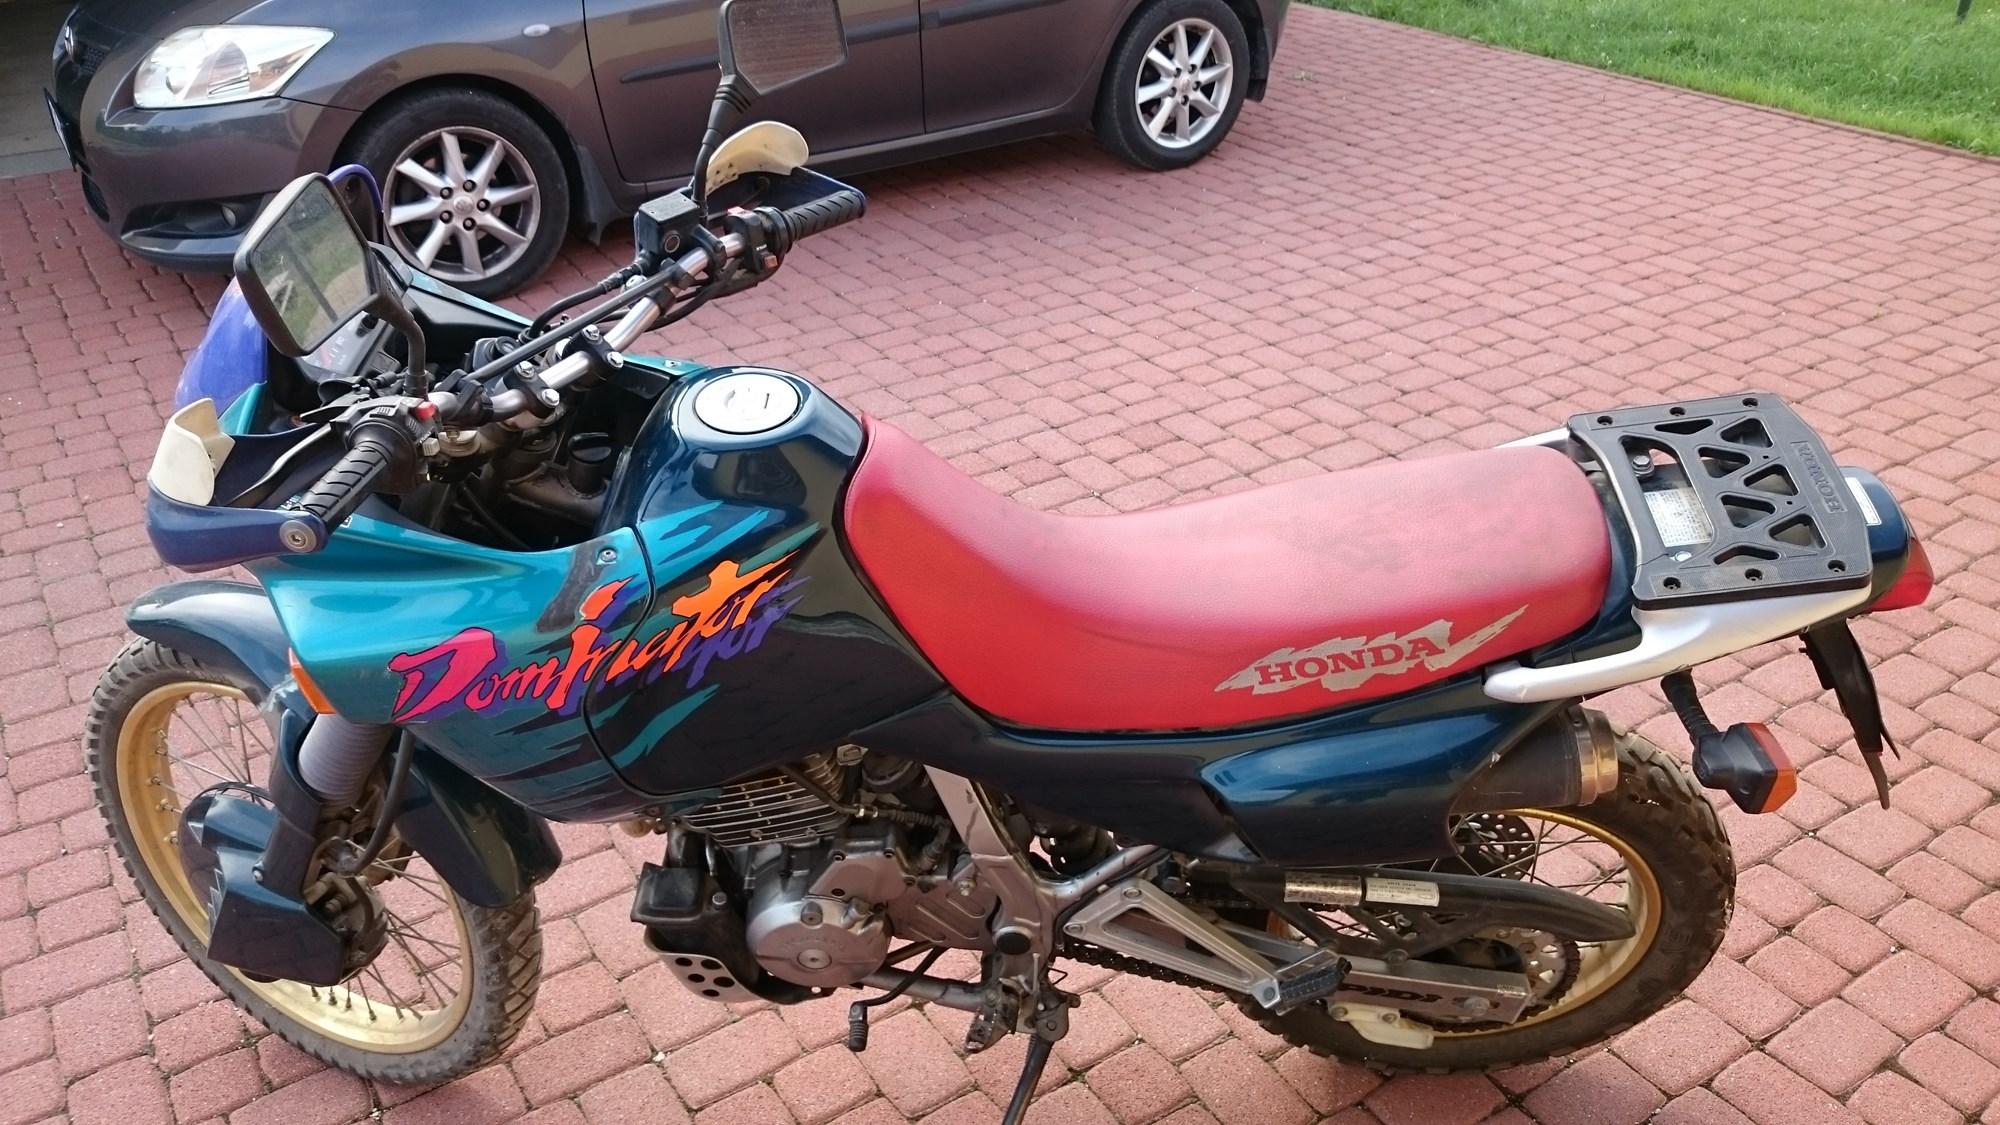 HONDA NX650, 4. kép